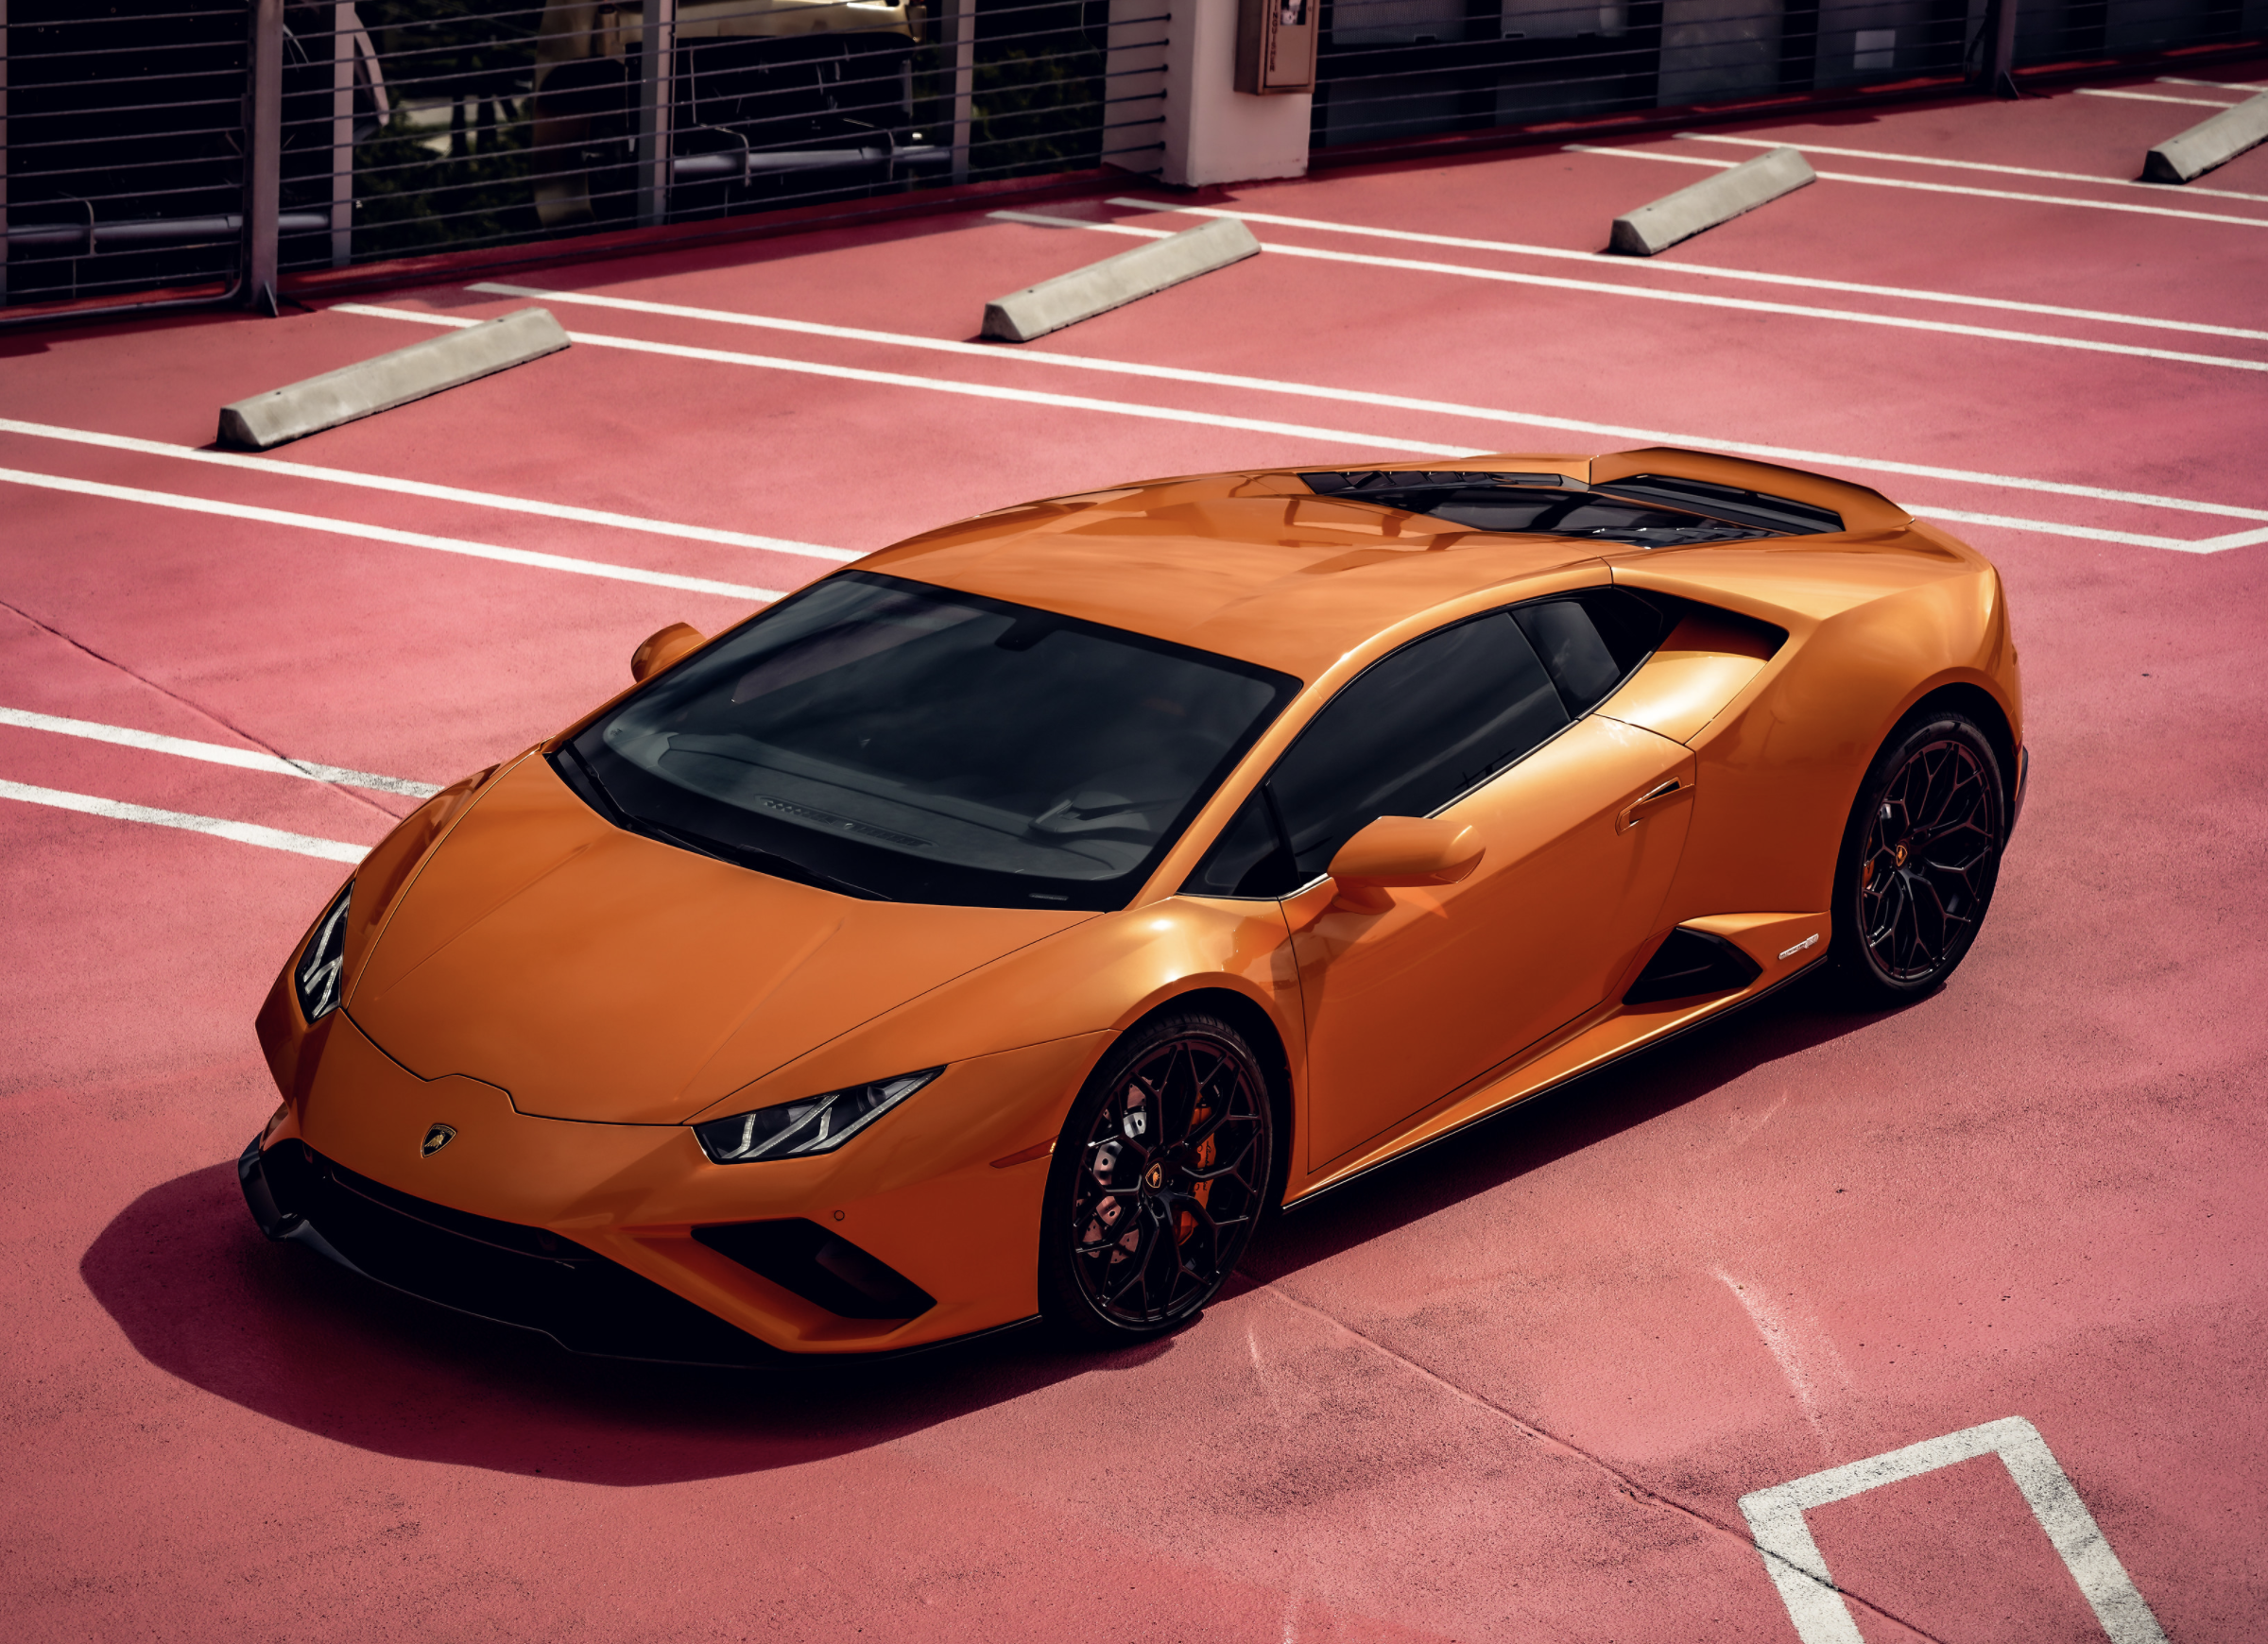 Image #11 of our  Lamborghini Huracan EVO Orange Coupe    In Miami Fort Lauderdale Palm Beach South Florida